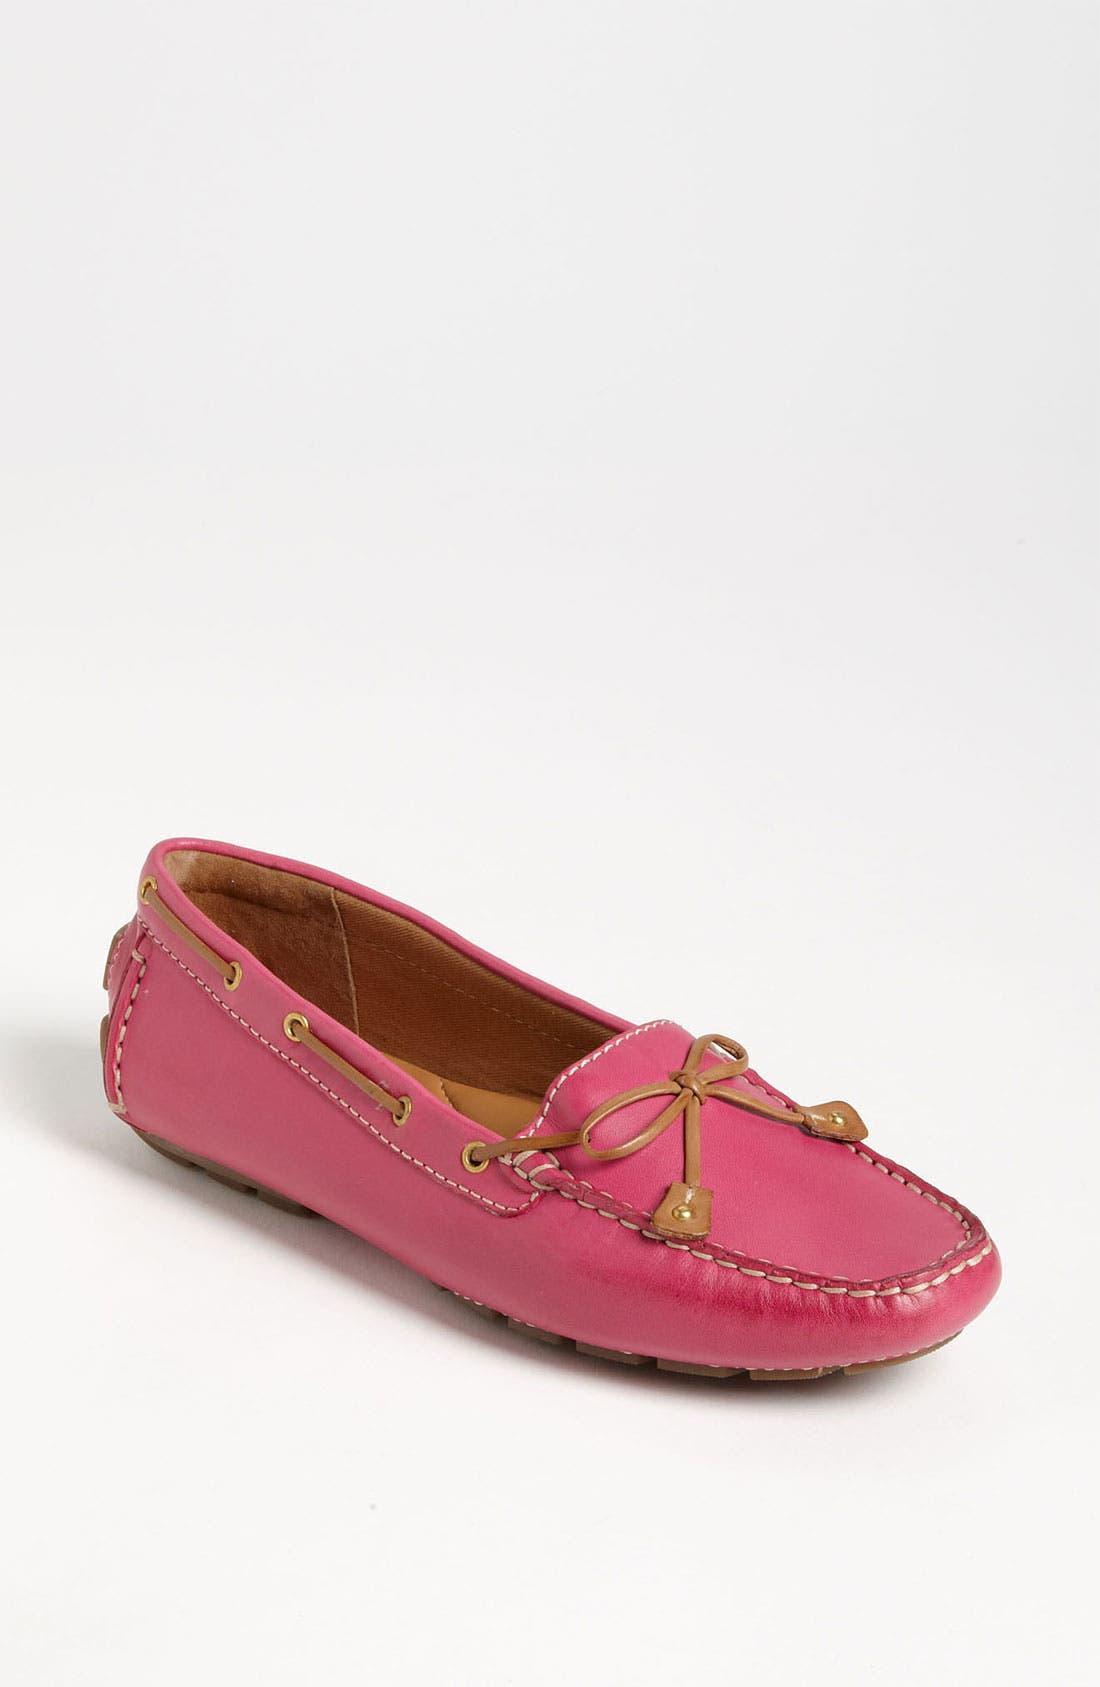 Alternate Image 1 Selected - Clarks® Artisan Collection 'Dunbar Racer' Loafer (Online Only)